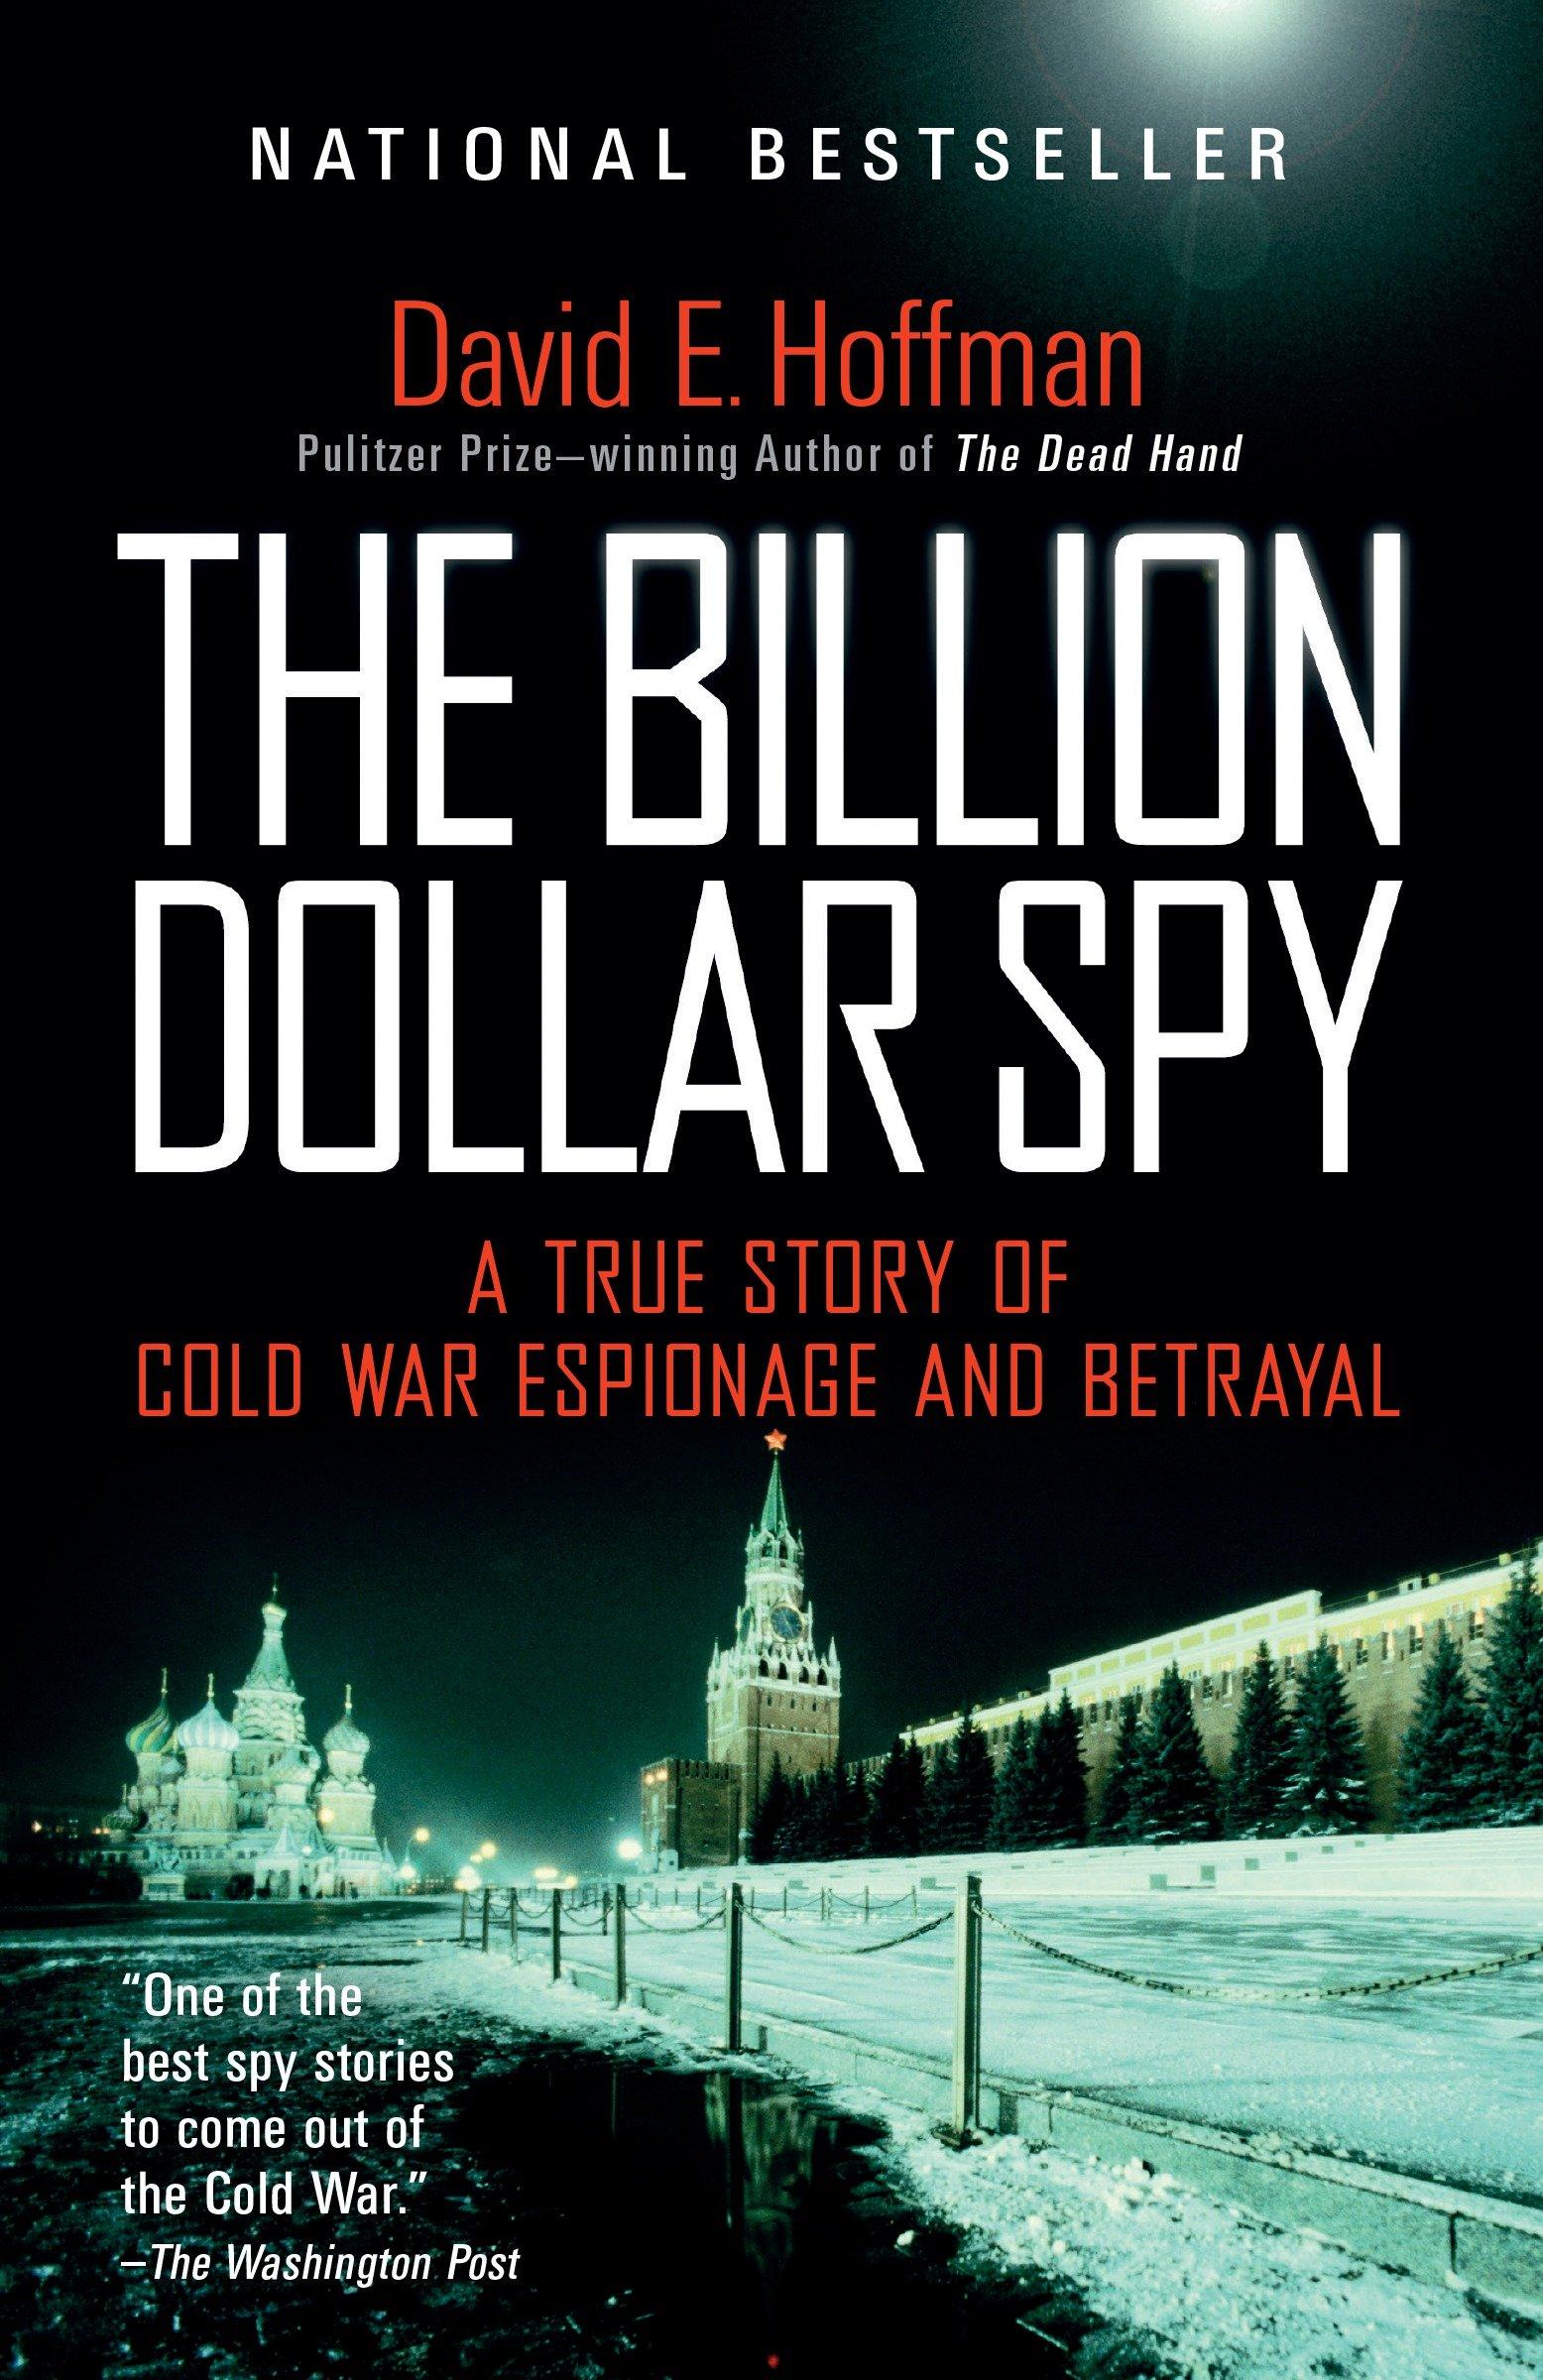 The Billion Dollar Spy A True Story of Cold War Espionage and Betrayal